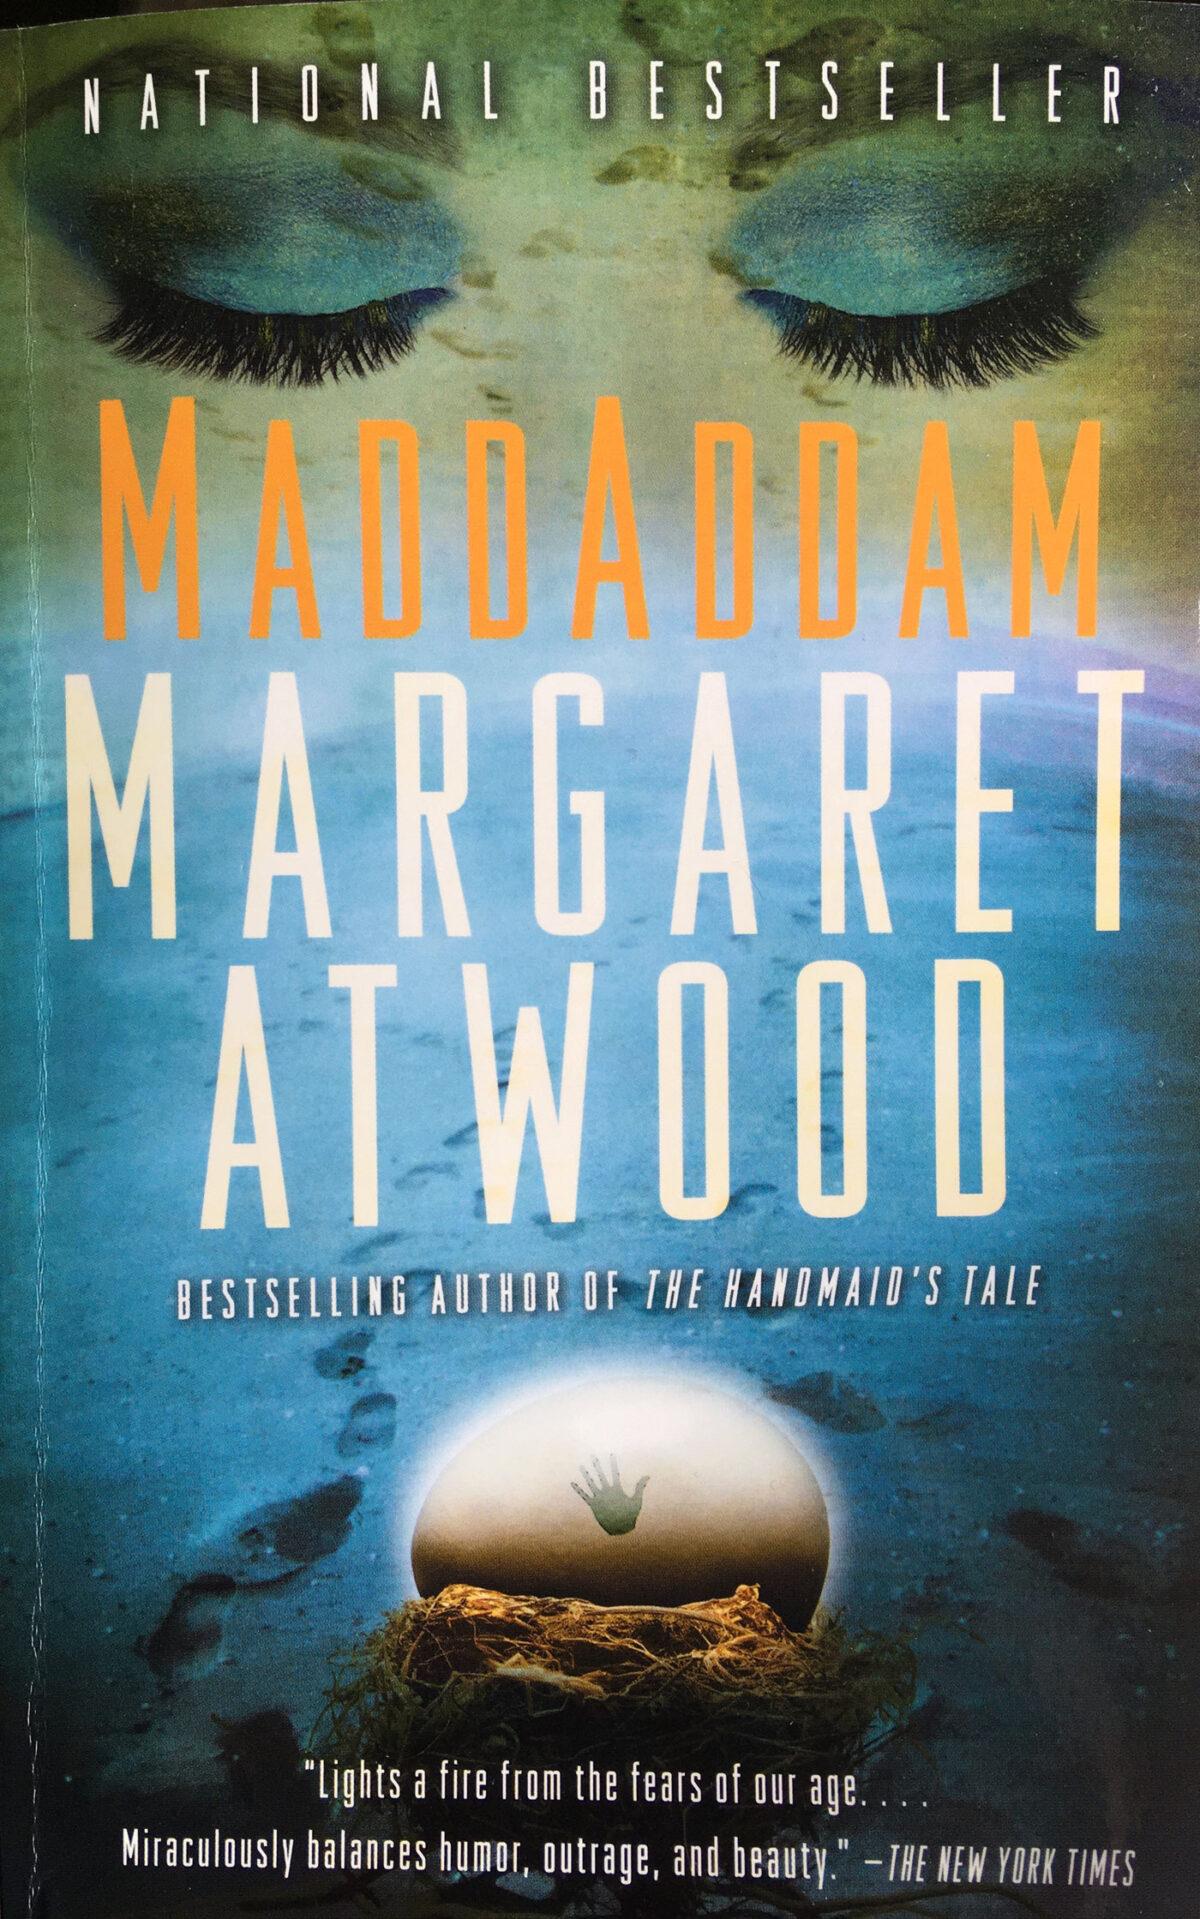 #042: MaddAddam, Riots